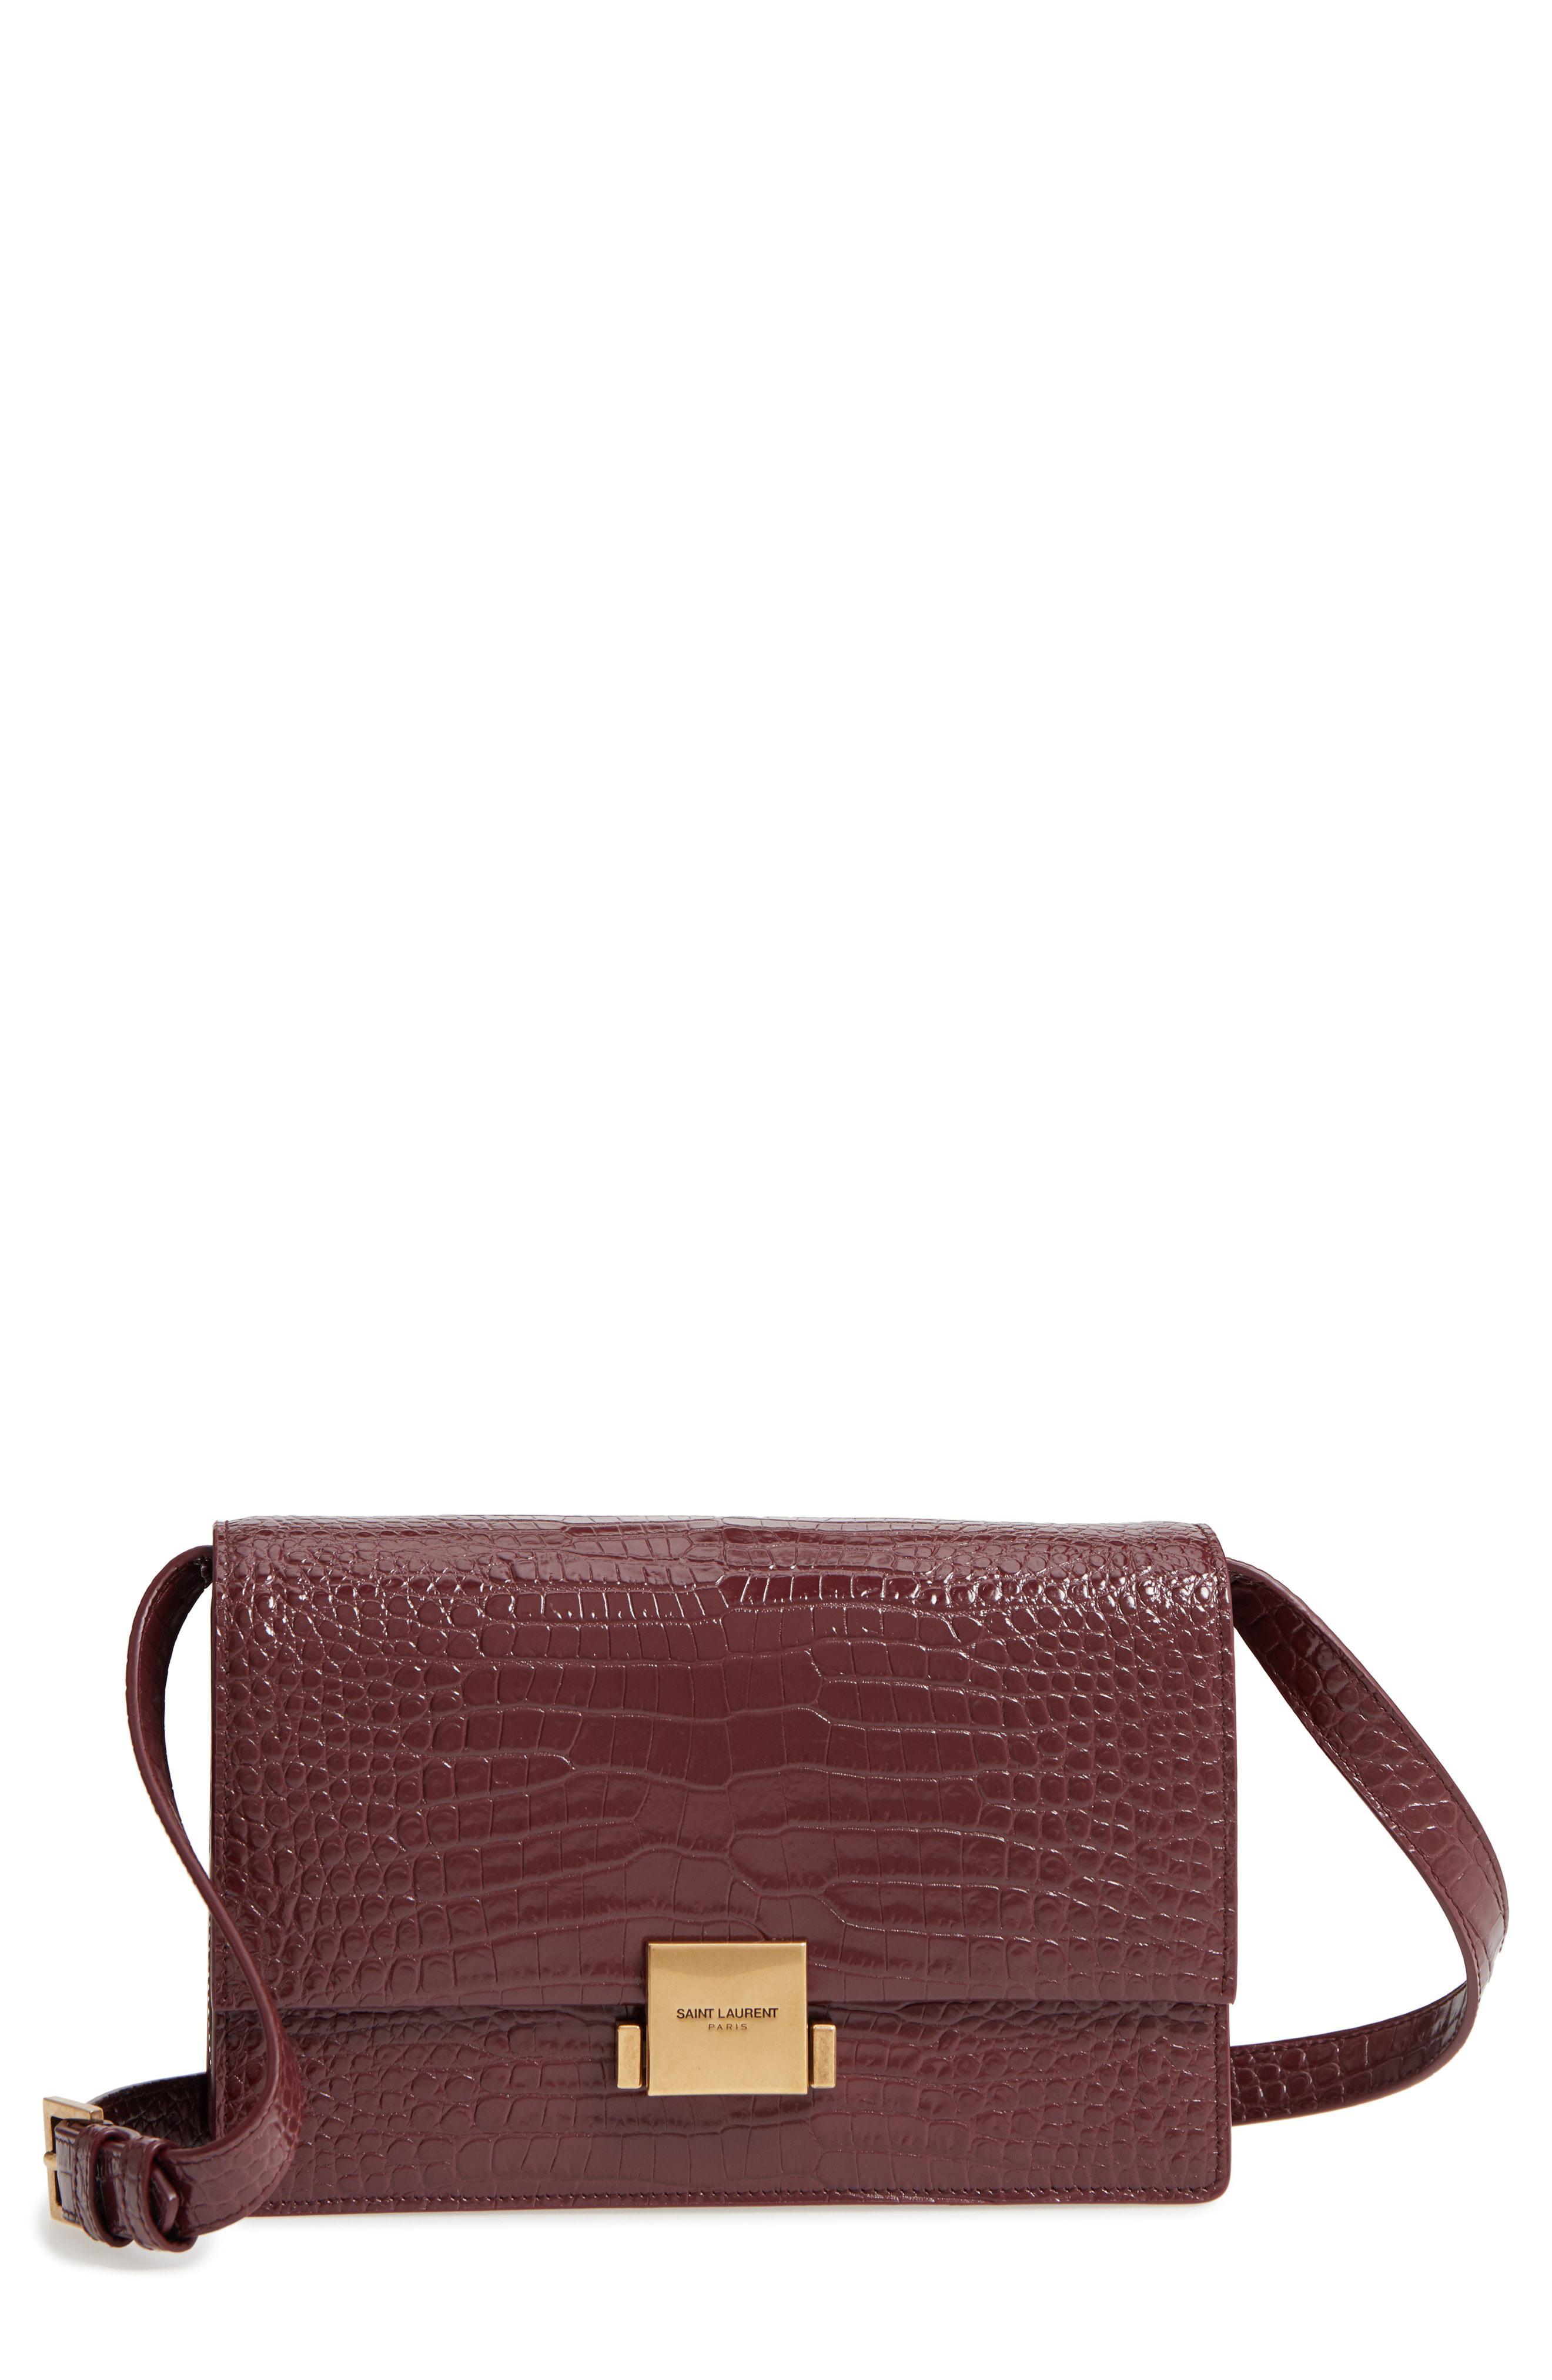 7e60b1dcb5 Saint Laurent Multicolor Medium Bellechasse Croc Embossed Leather Shoulder  Bag -